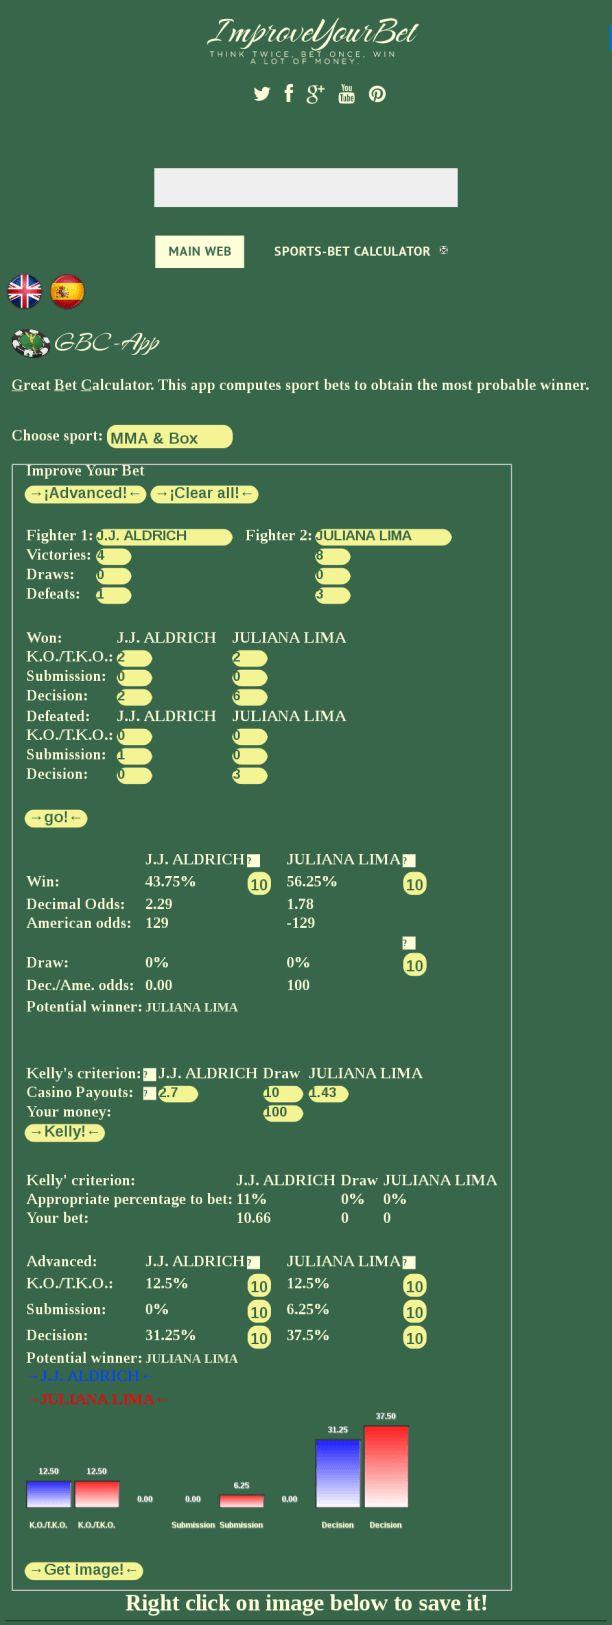 ufc-fight-night-forecast-and-predictions-juliana-lima-vs-j-j-aldrich